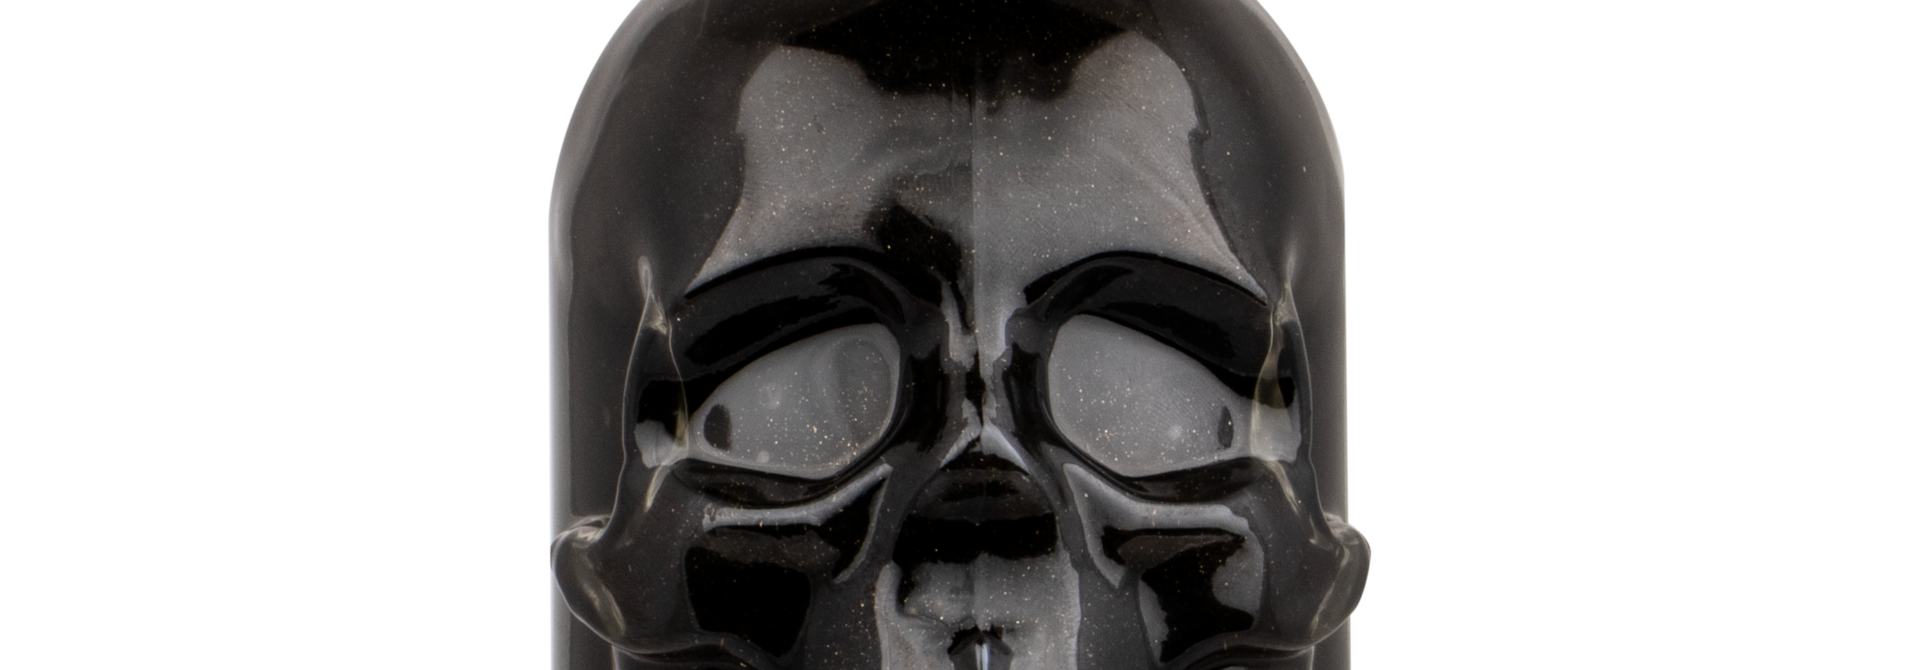 Saus.Guru's Skull Hot Sauce Black Gold